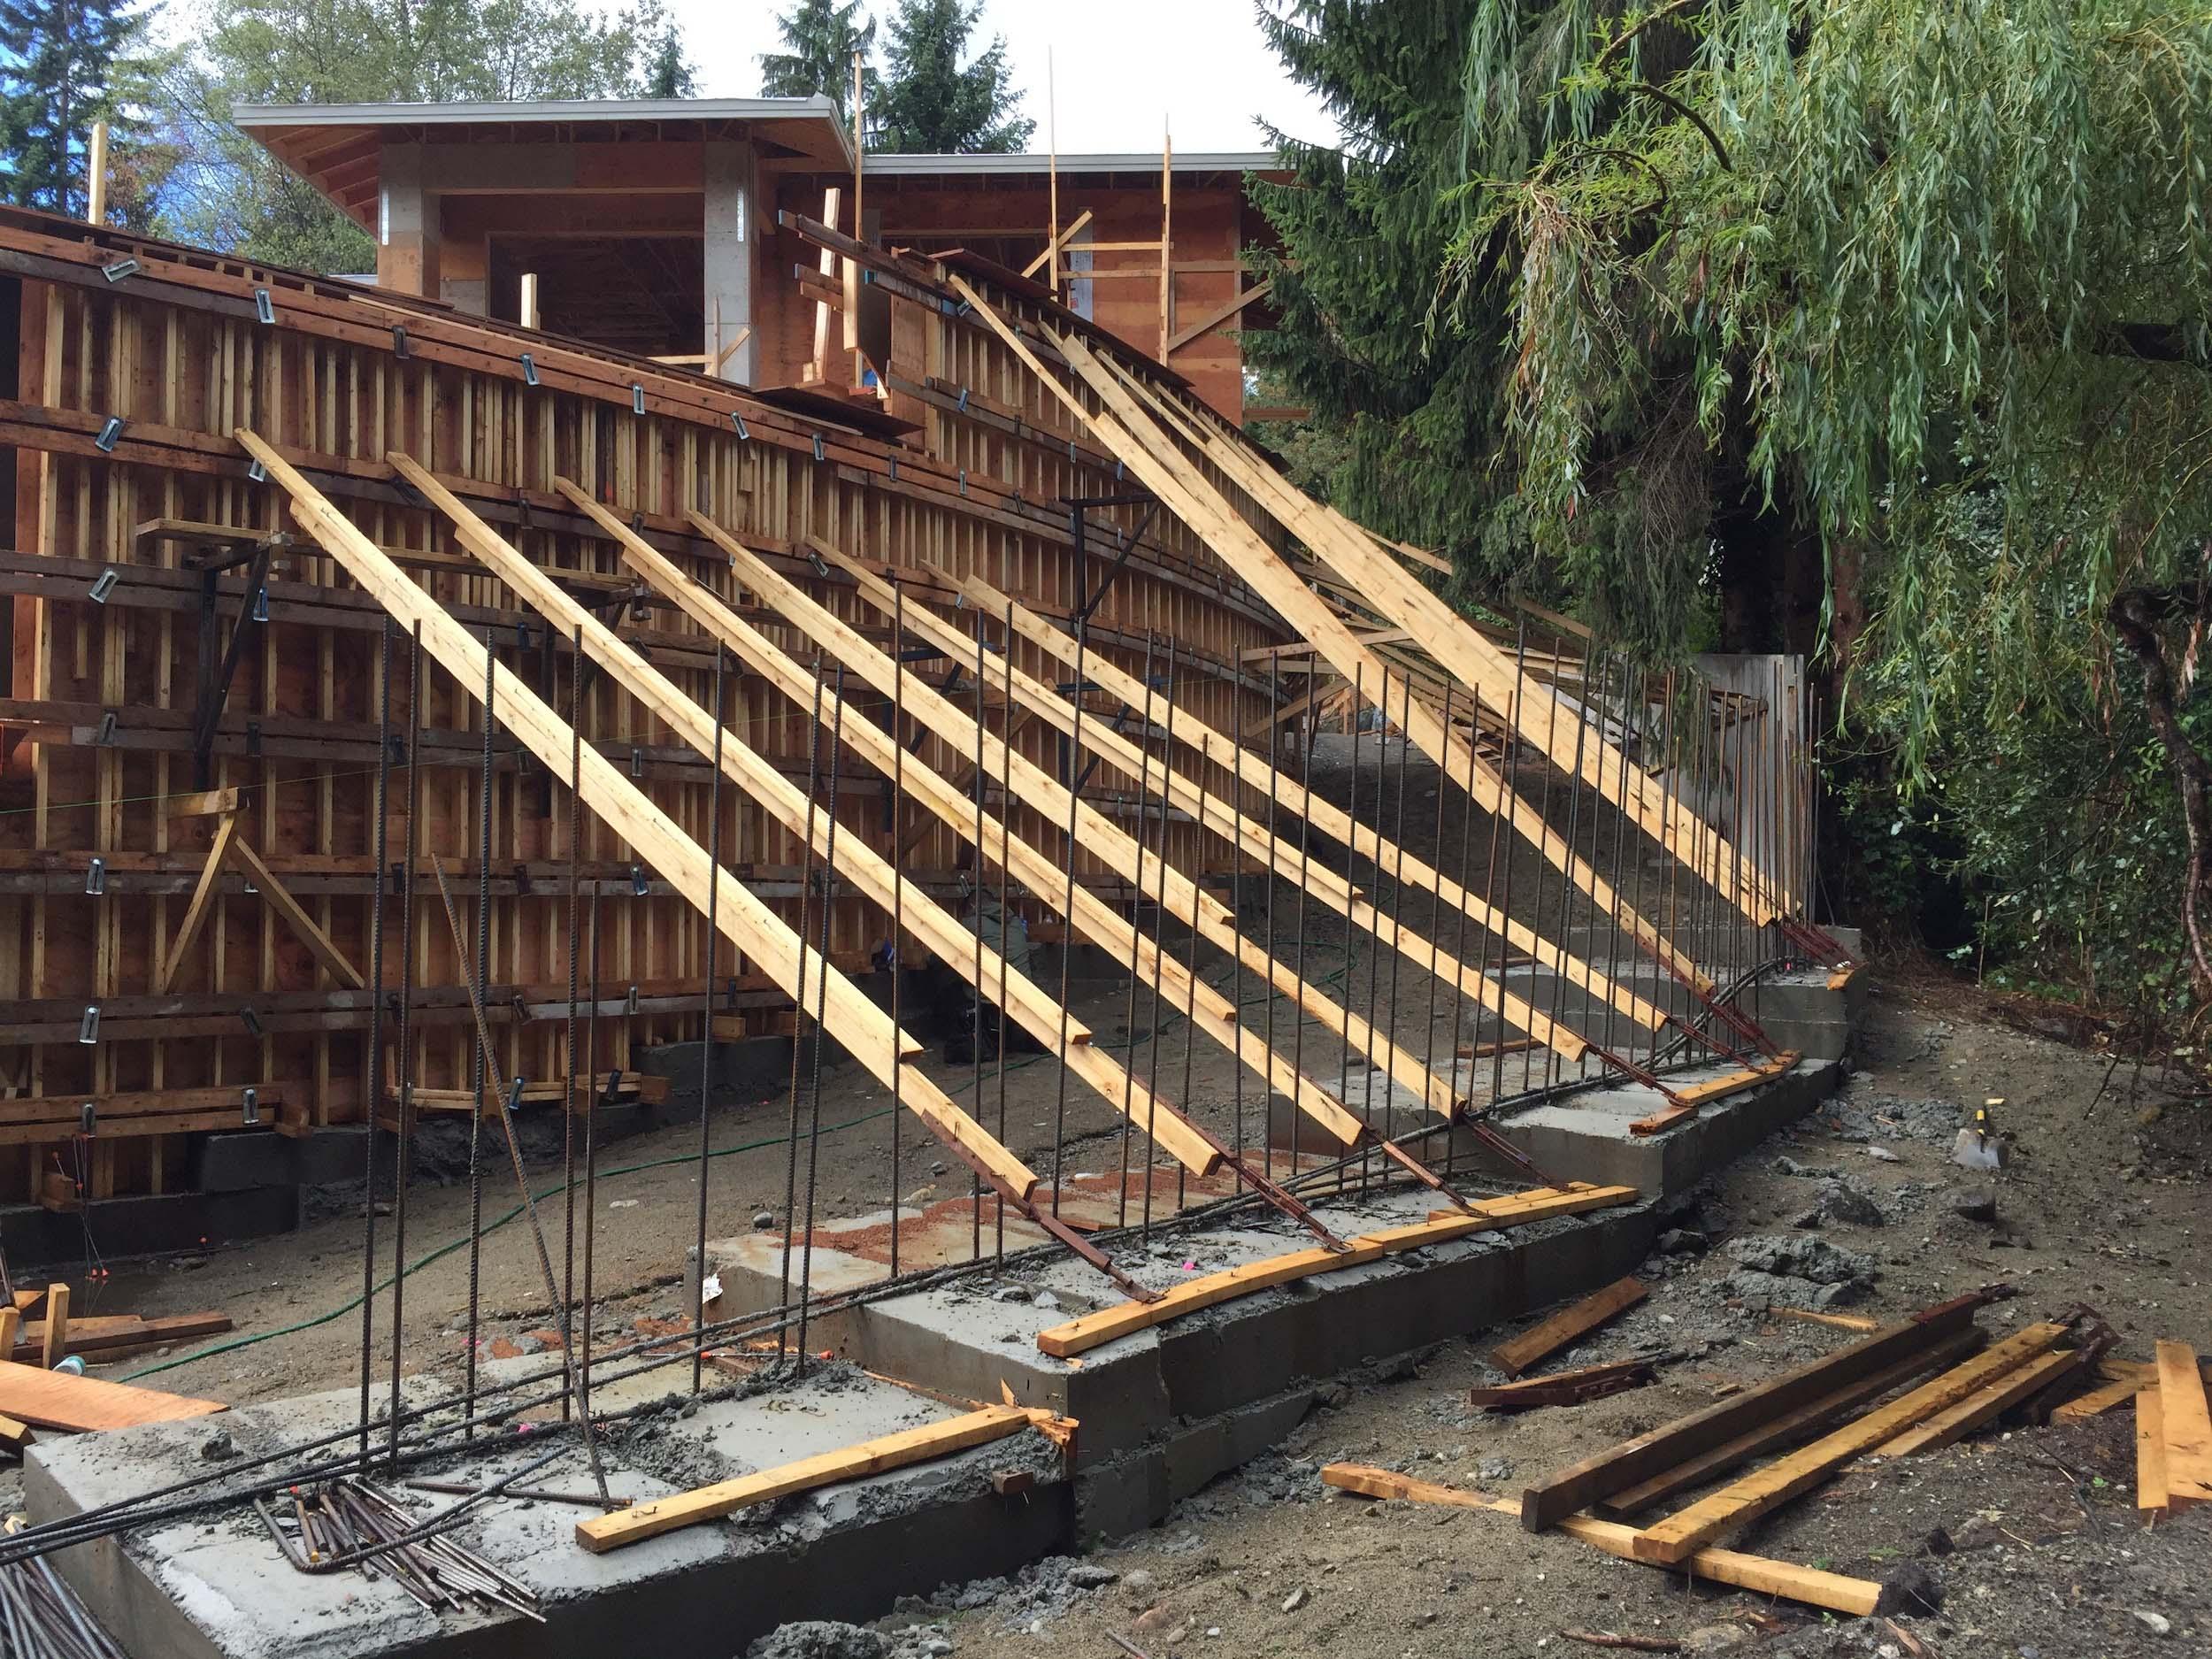 Postle_Construction_ConcreteForming34.jpg